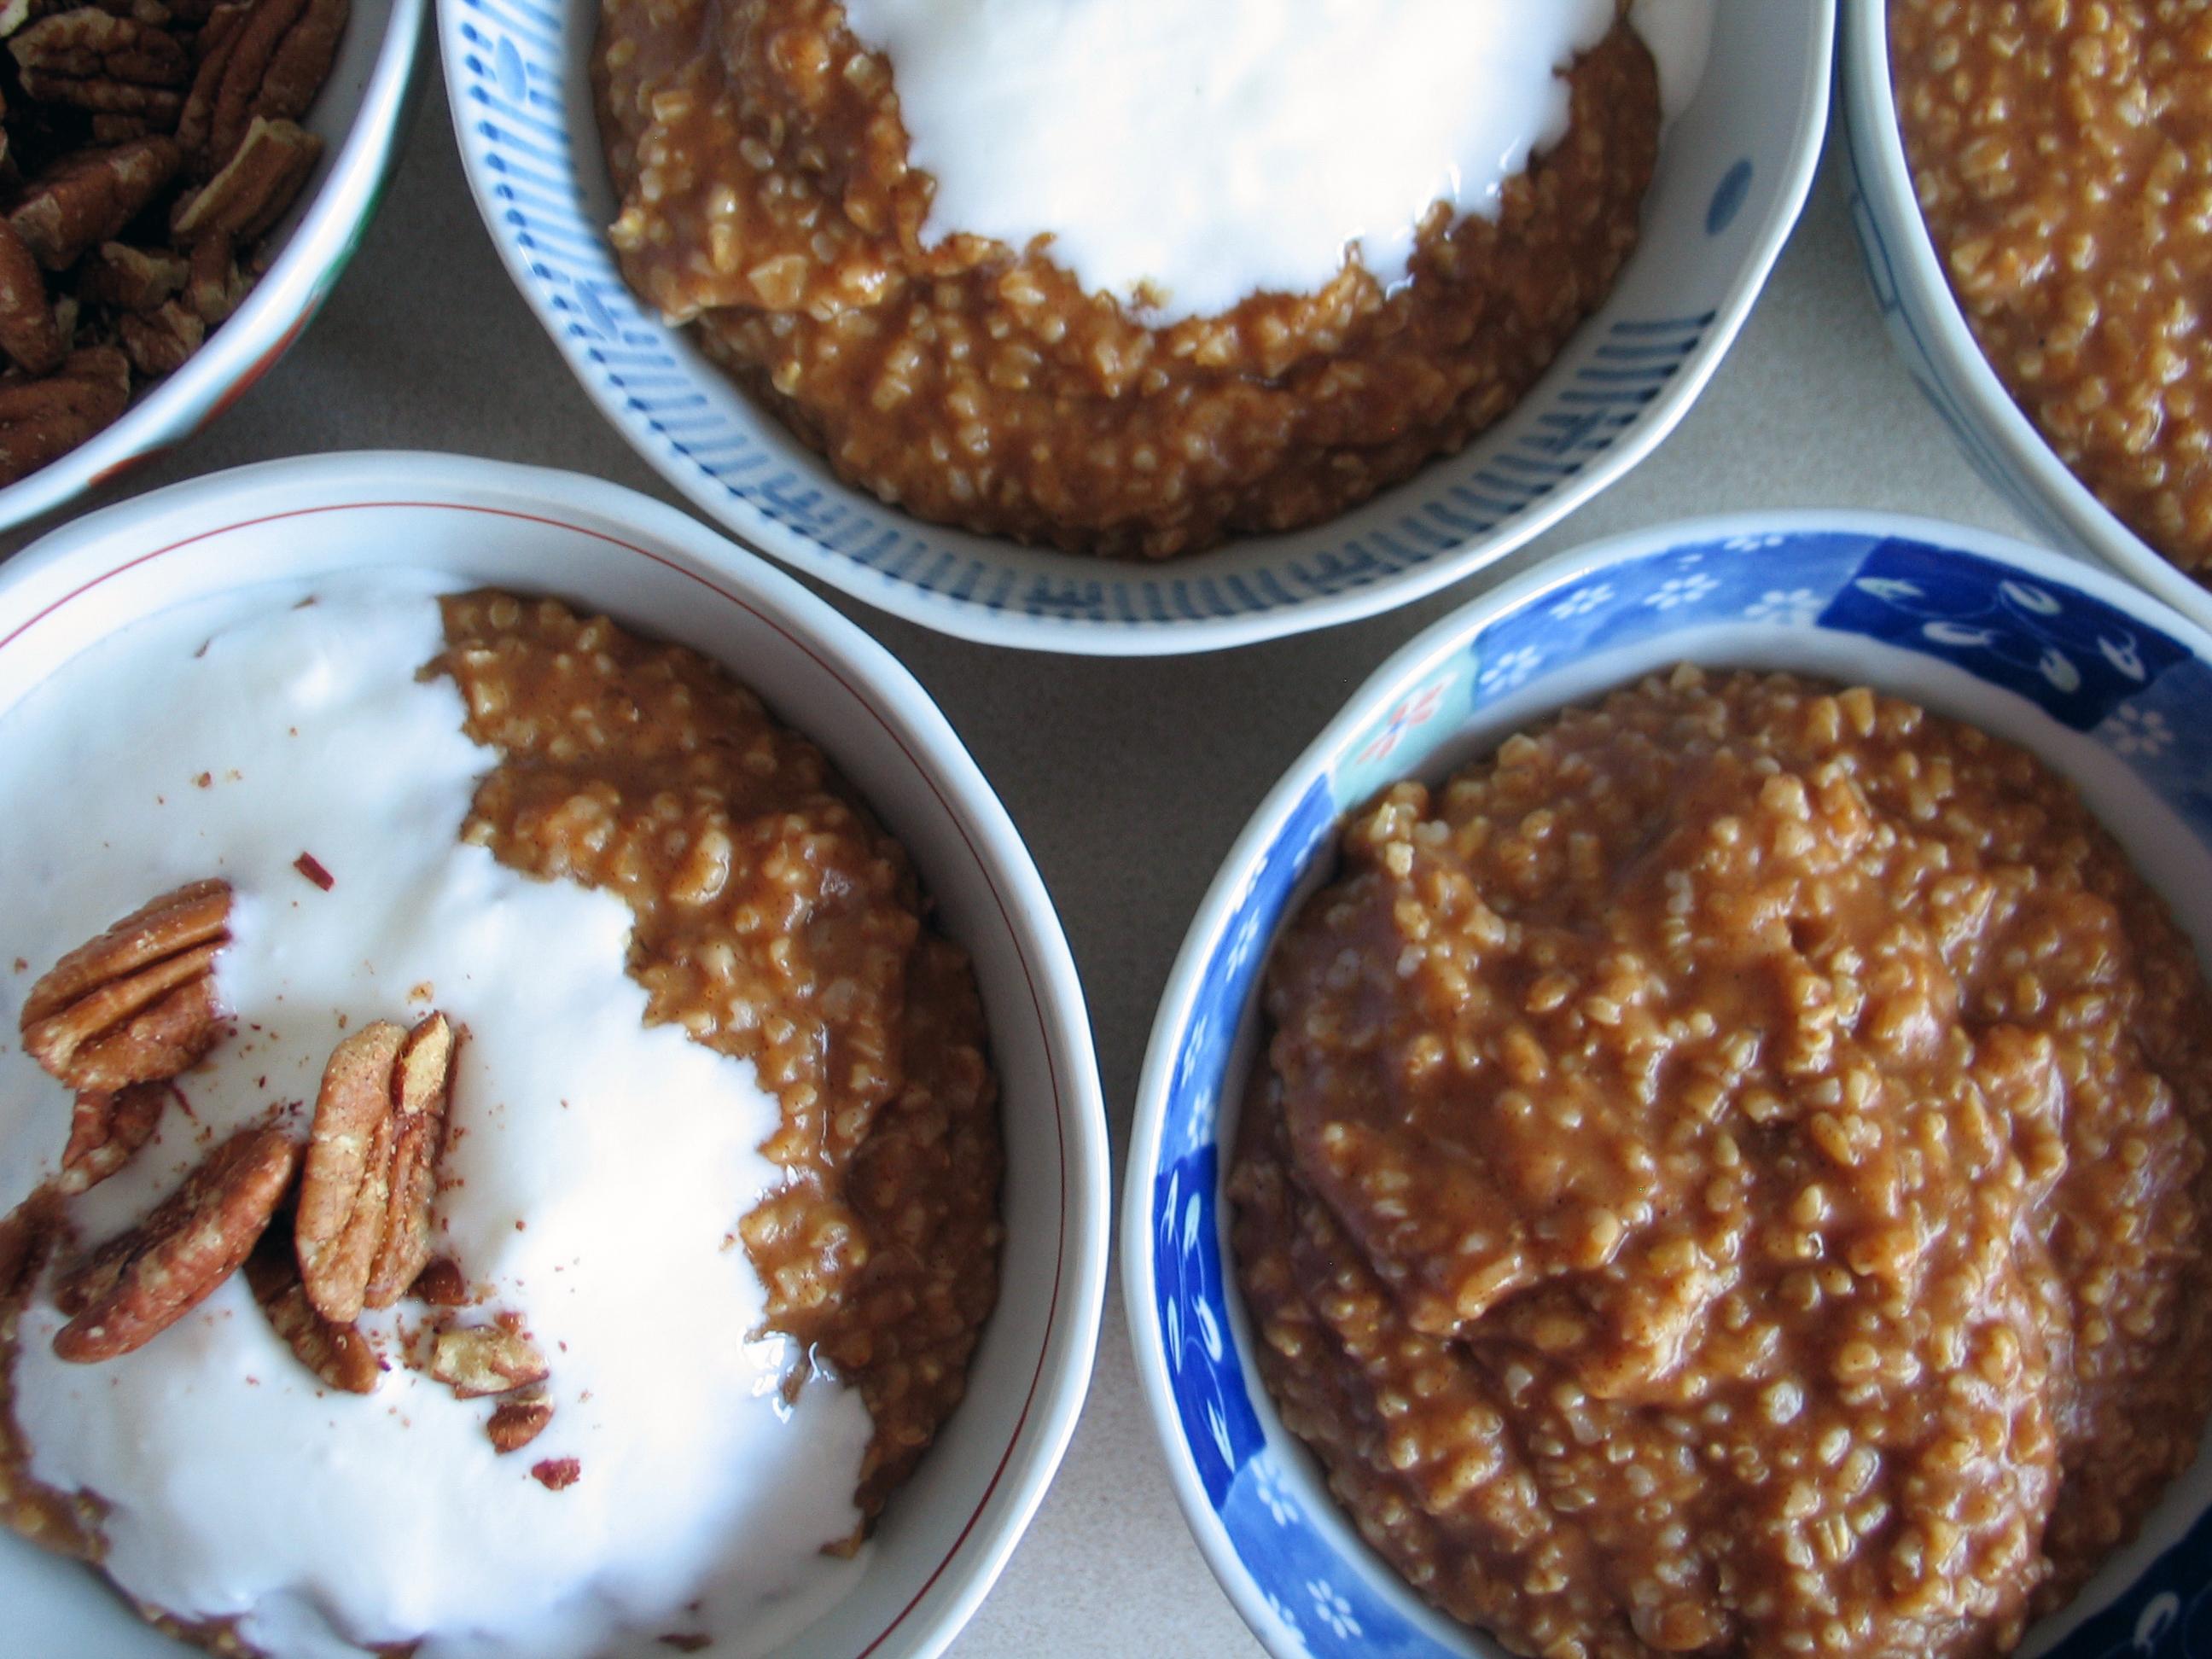 Oatmeal (Pumpkin Pie and Apple Pie)